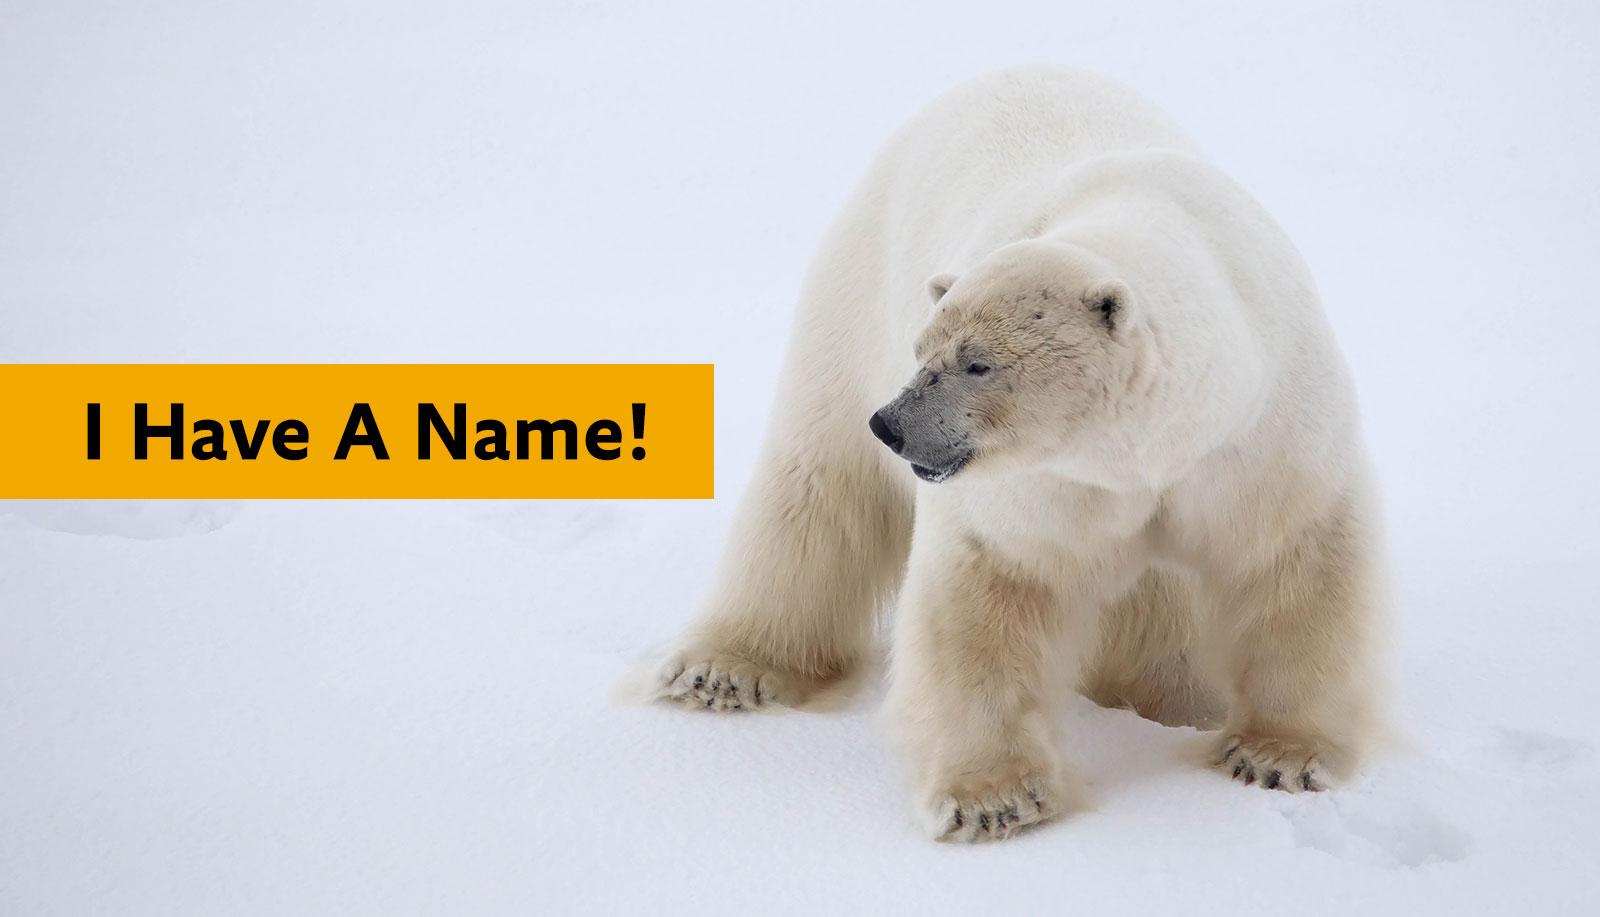 Polaris the polar bear